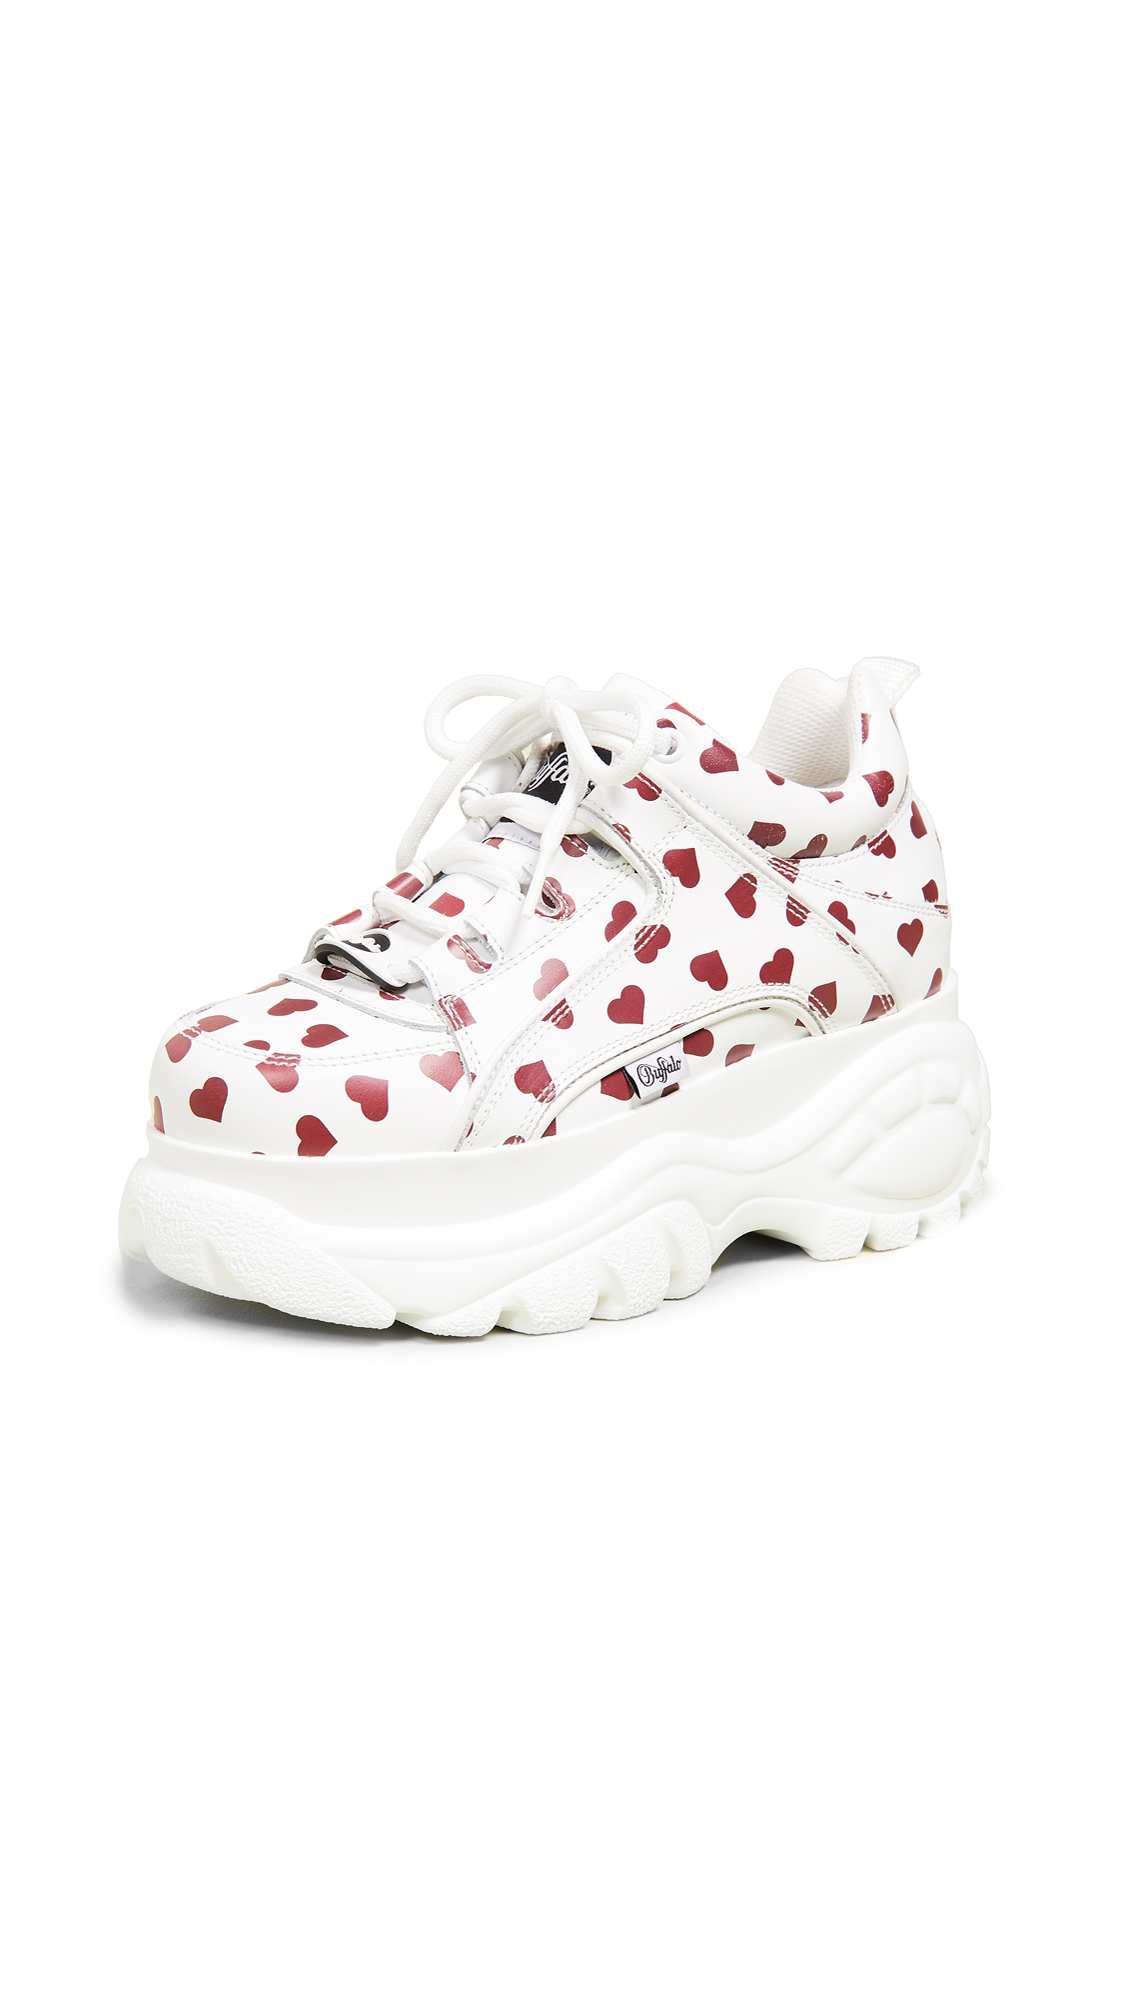 Buffalo London Classic Kicks Sneakers - White/Red Hearts